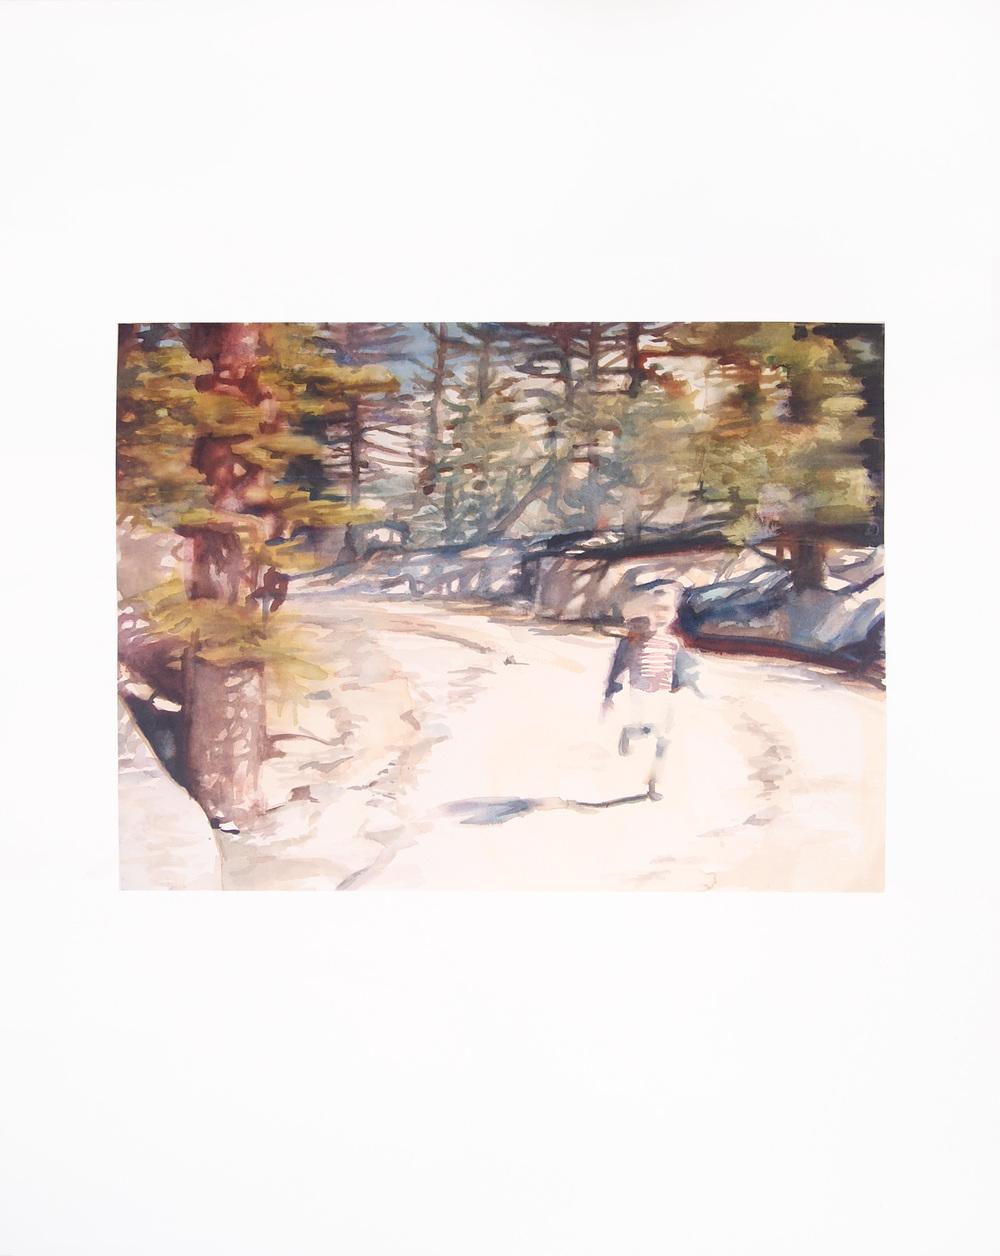 Image (Yellowstone). 2014. Watercolor. 67cm x 84.5cm.